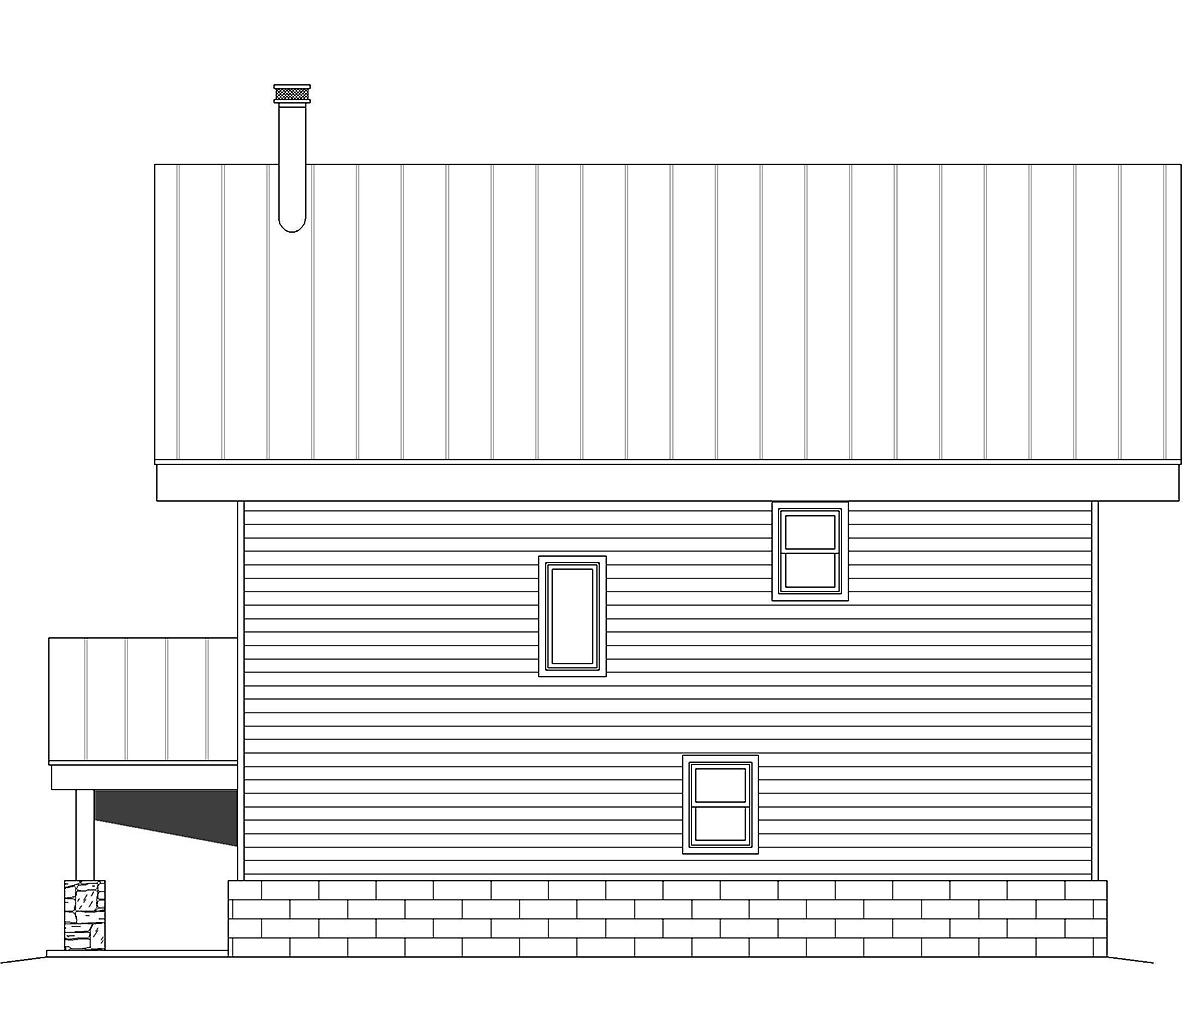 Coastal, Contemporary, Modern Garage-Living Plan 40863 with 2 Beds, 2 Baths, 2 Car Garage Rear Elevation